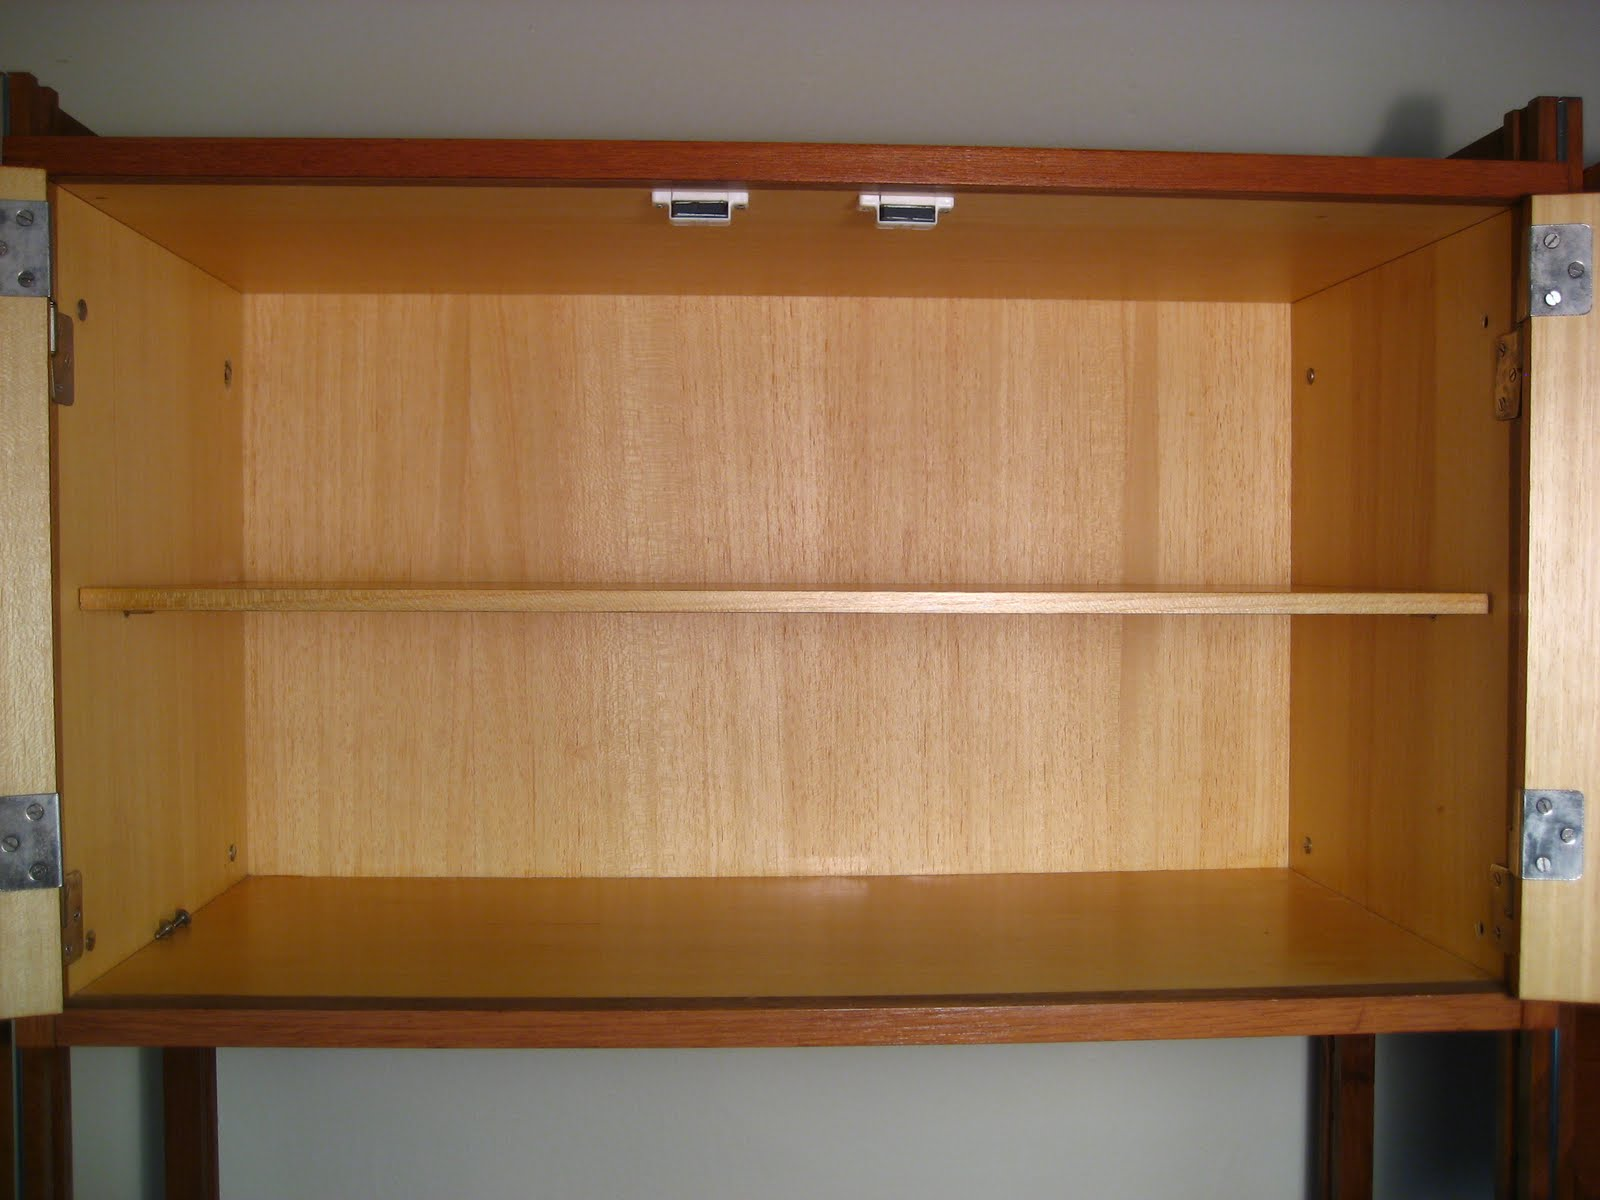 http://3.bp.blogspot.com/-0tejlLKKWAw/TfUXKcDnkkI/AAAAAAAACcE/KikLNoKPNa0/s1600/teak+modular+wall+unit+010.jpg